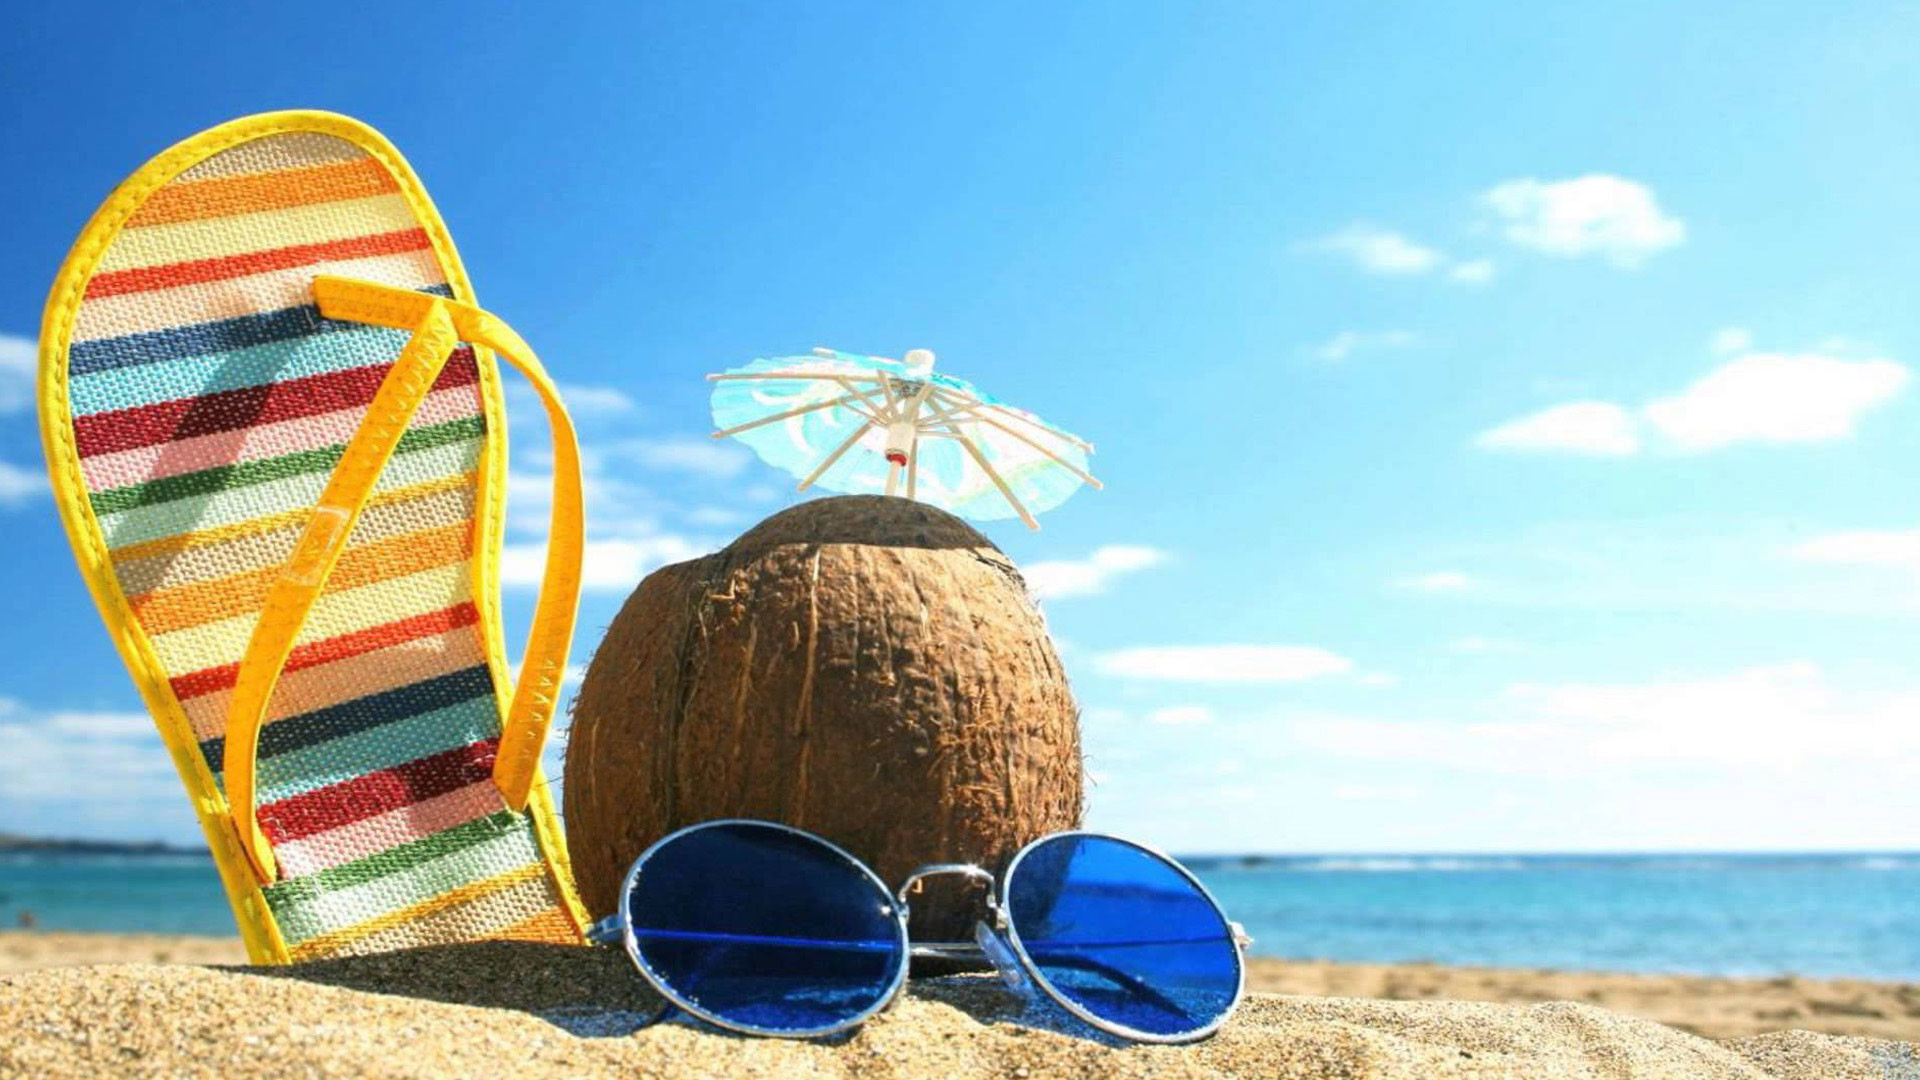 hd pics photos best beach holidays beautiful sea hd quality desktop  background wallpaper